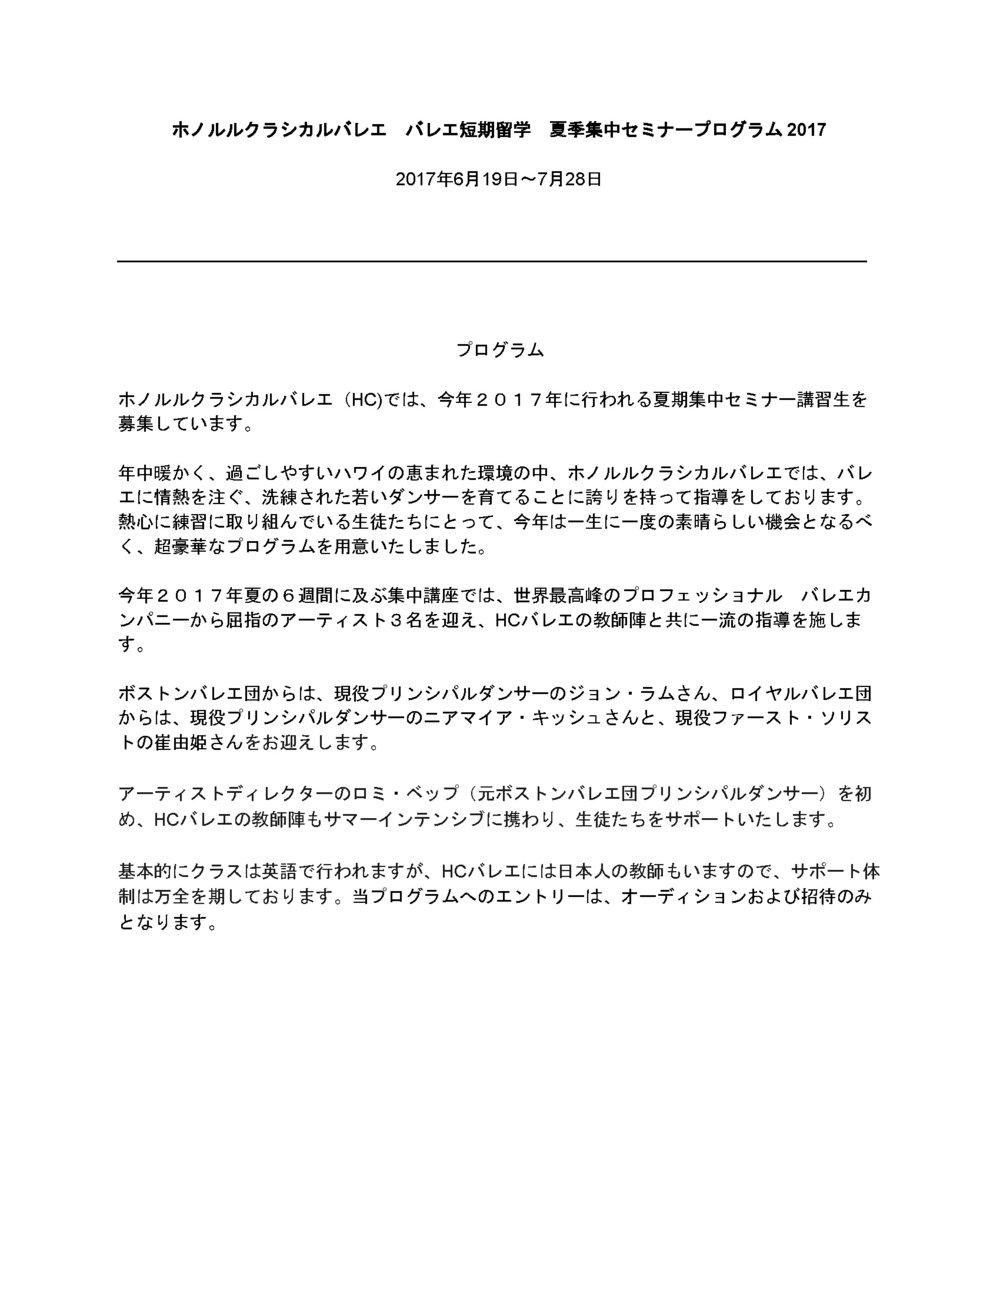 hcb_summer_japanese